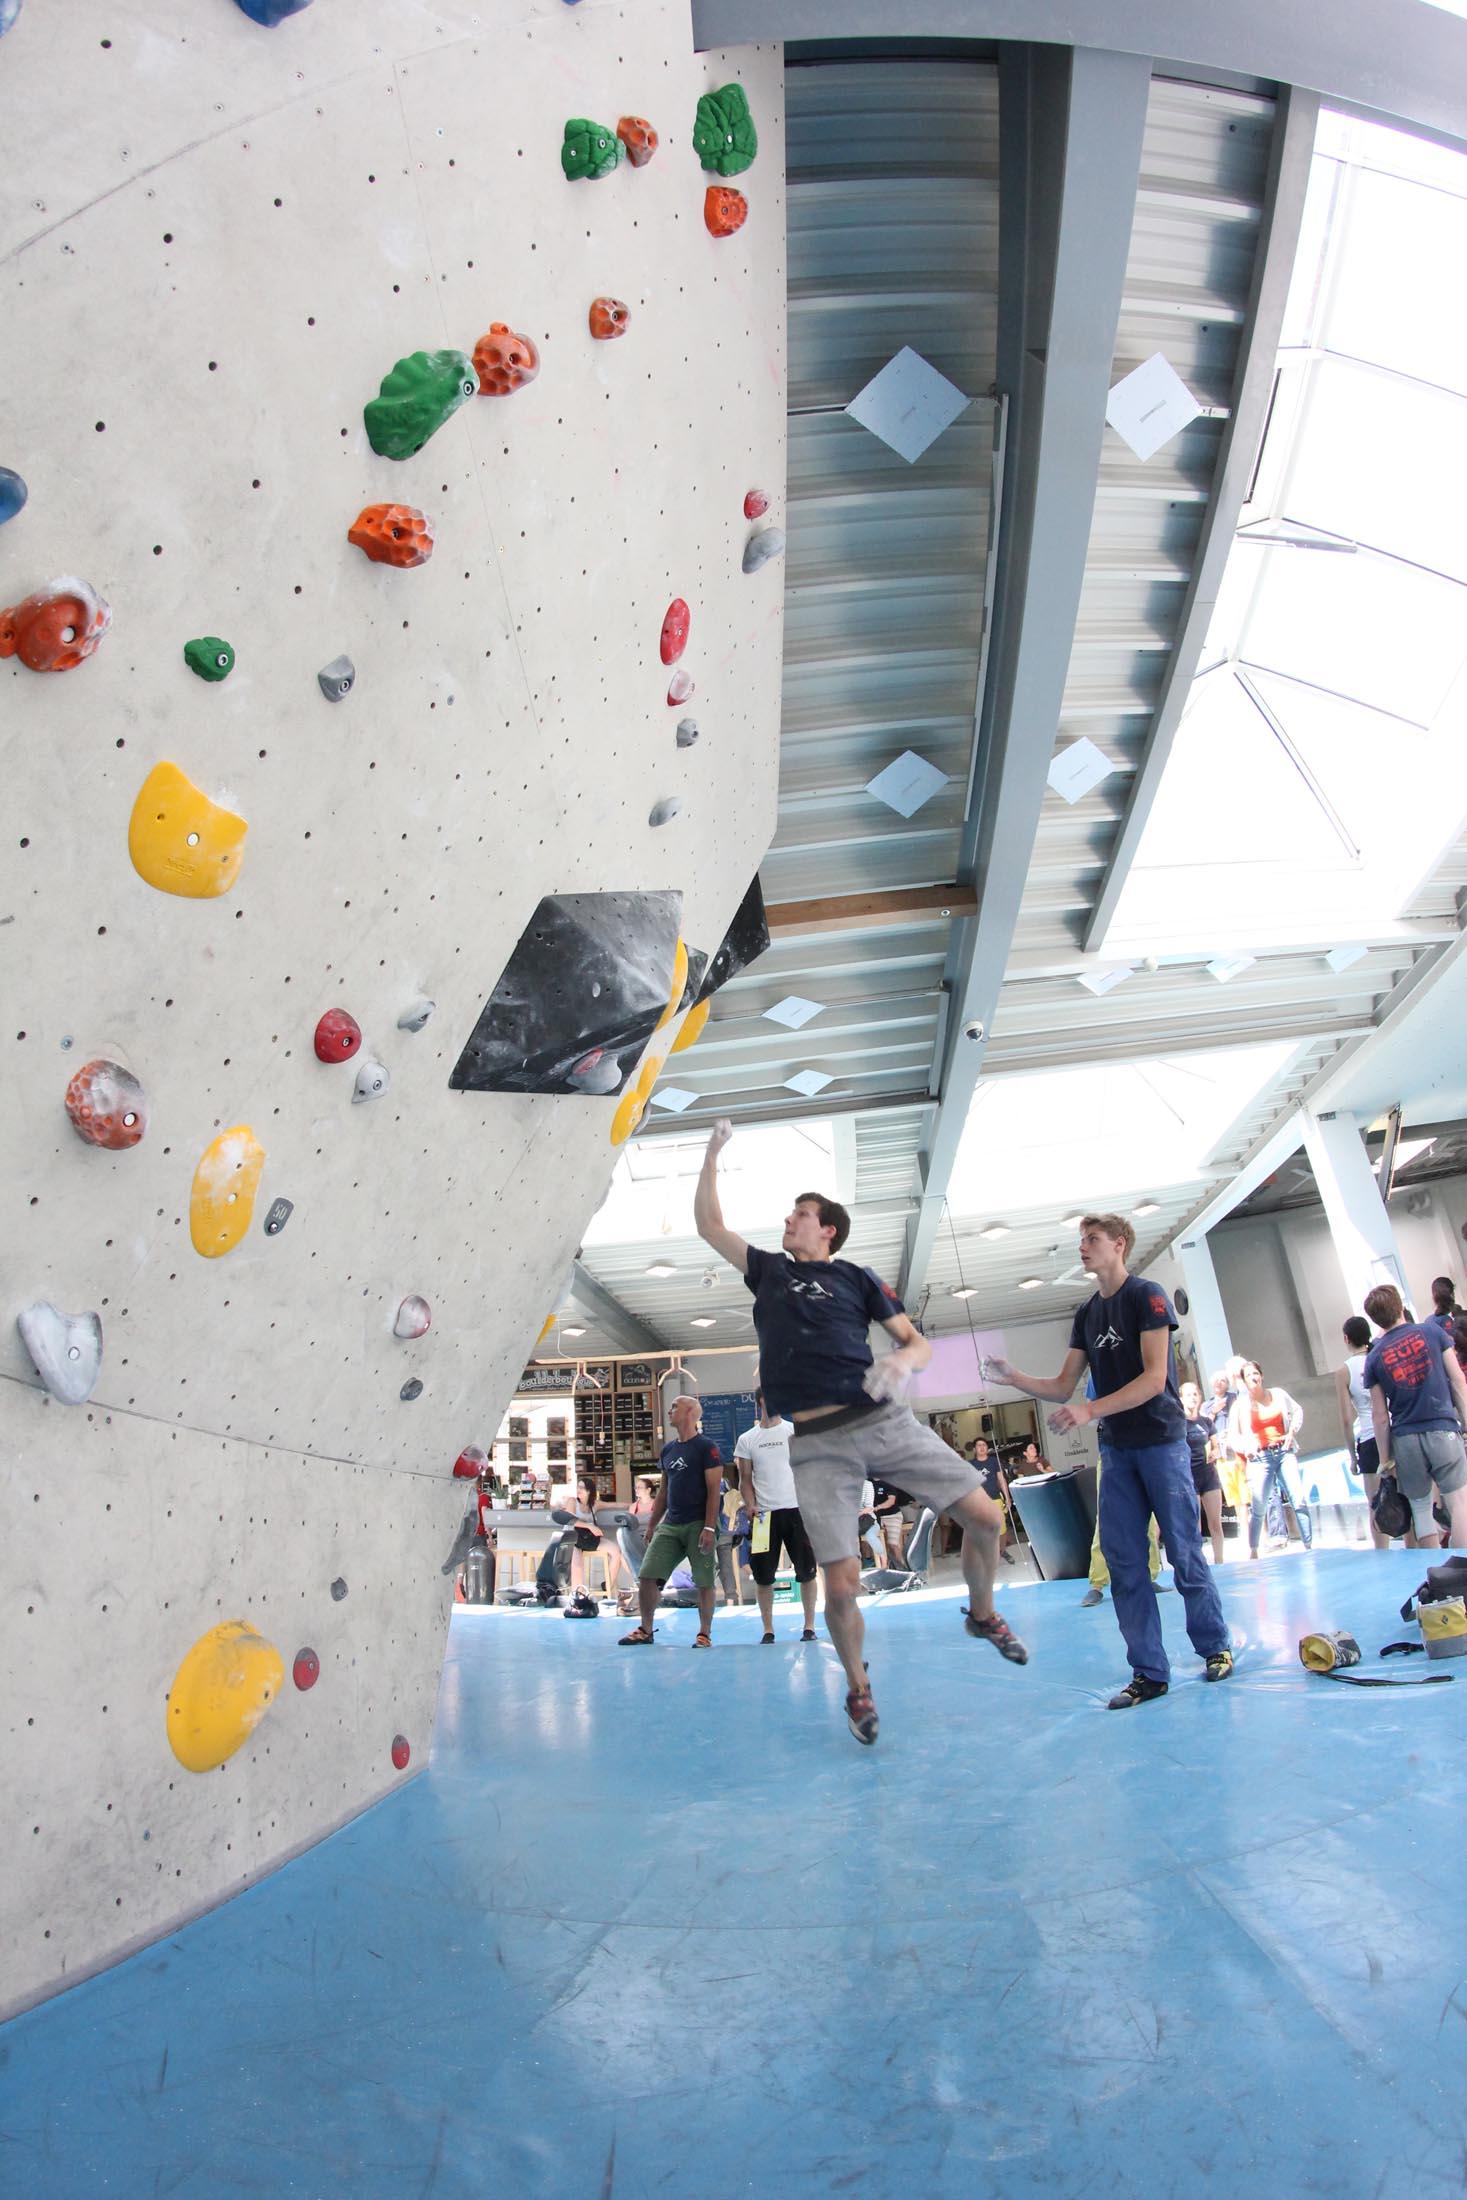 Quali, internationaler bouldercup Frankenjura 2016, BLOCKHELDEN Erlangen, Mammut, Bergfreunde.de, Boulderwettkampf07092016125